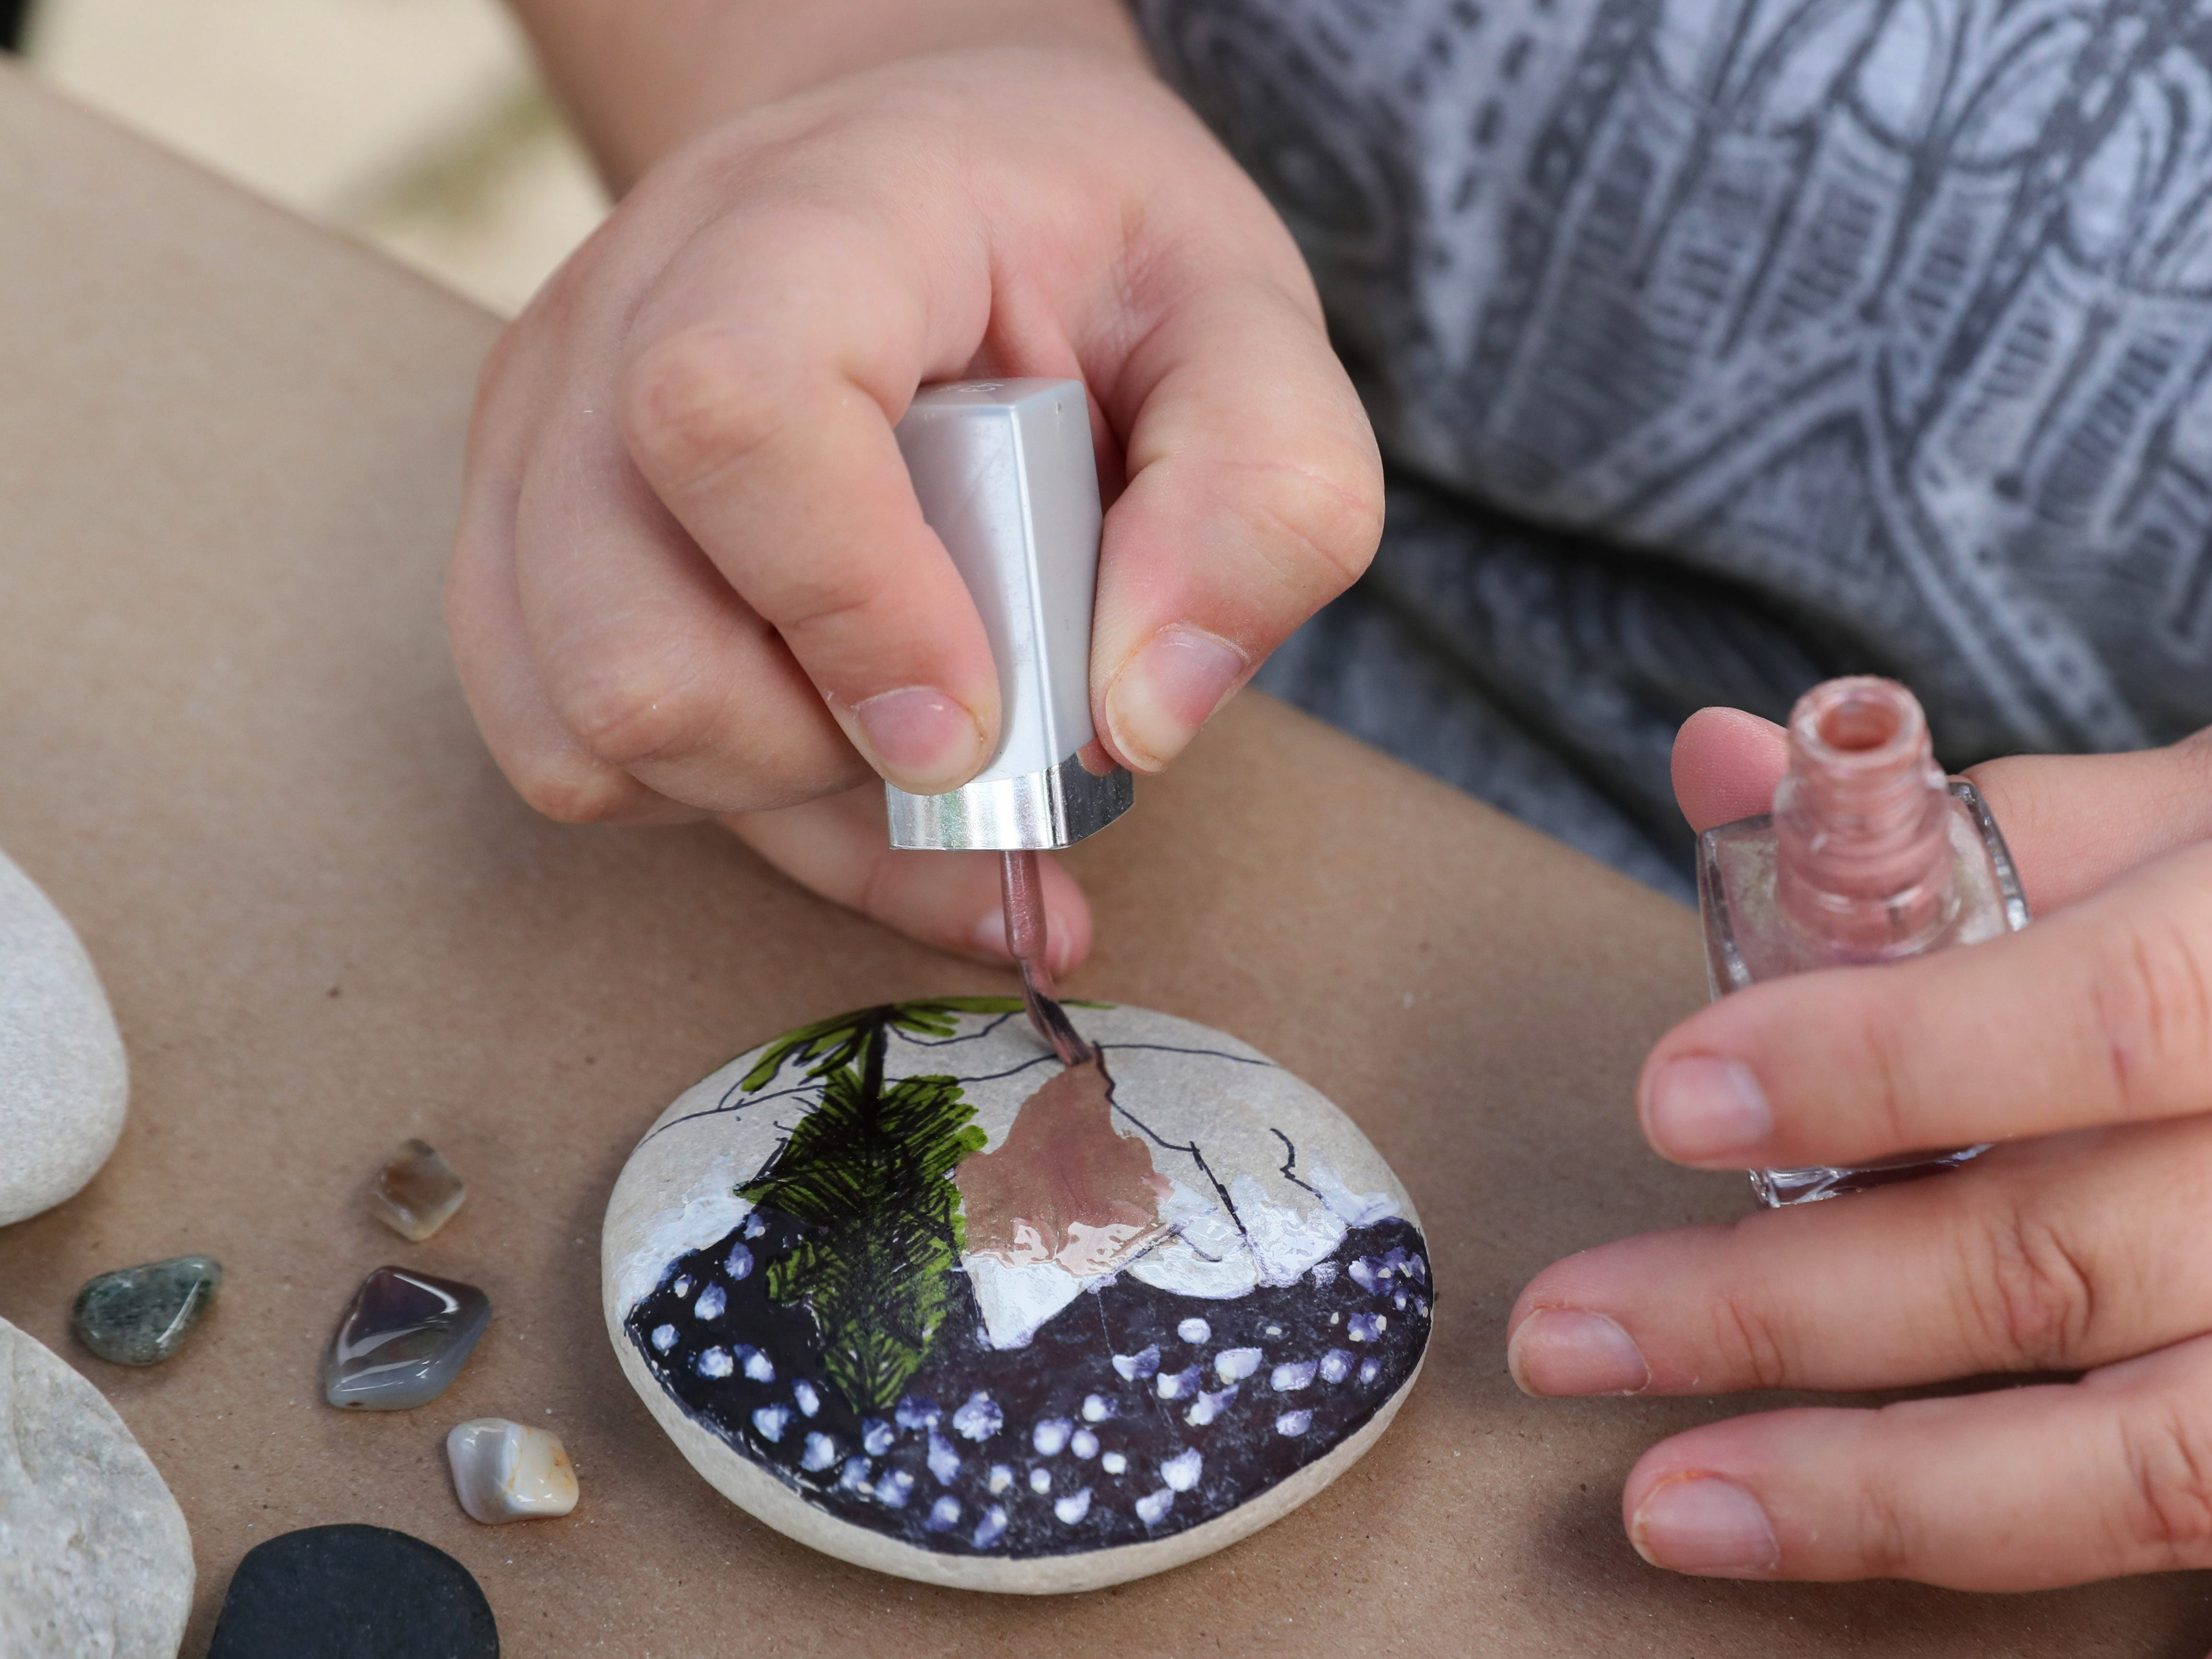 Heather Zunker paints a rock, using nail polish.